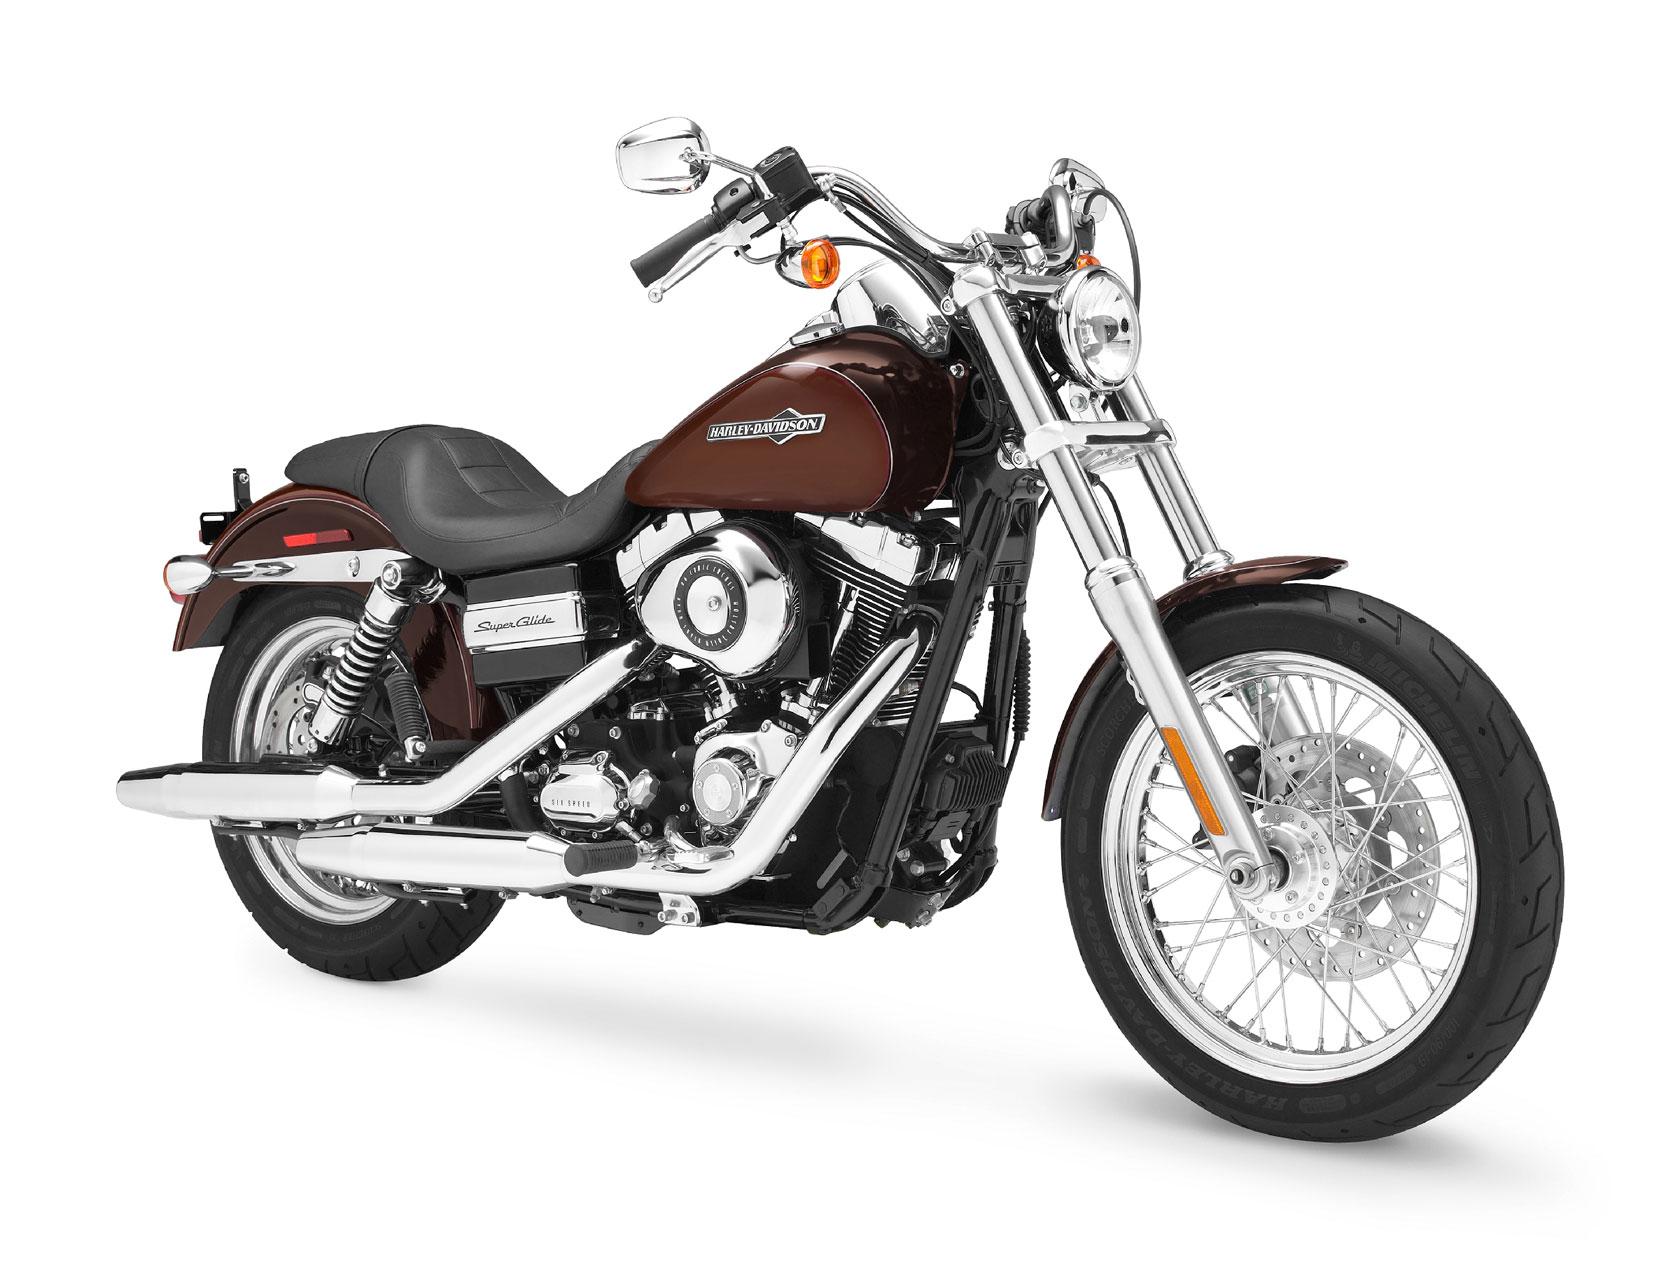 Harley Davidson Dyna Super Glide Custom 2013 Wallpapers: 2011 Harley Davidson FXDC Dyna Super Glide Custom F